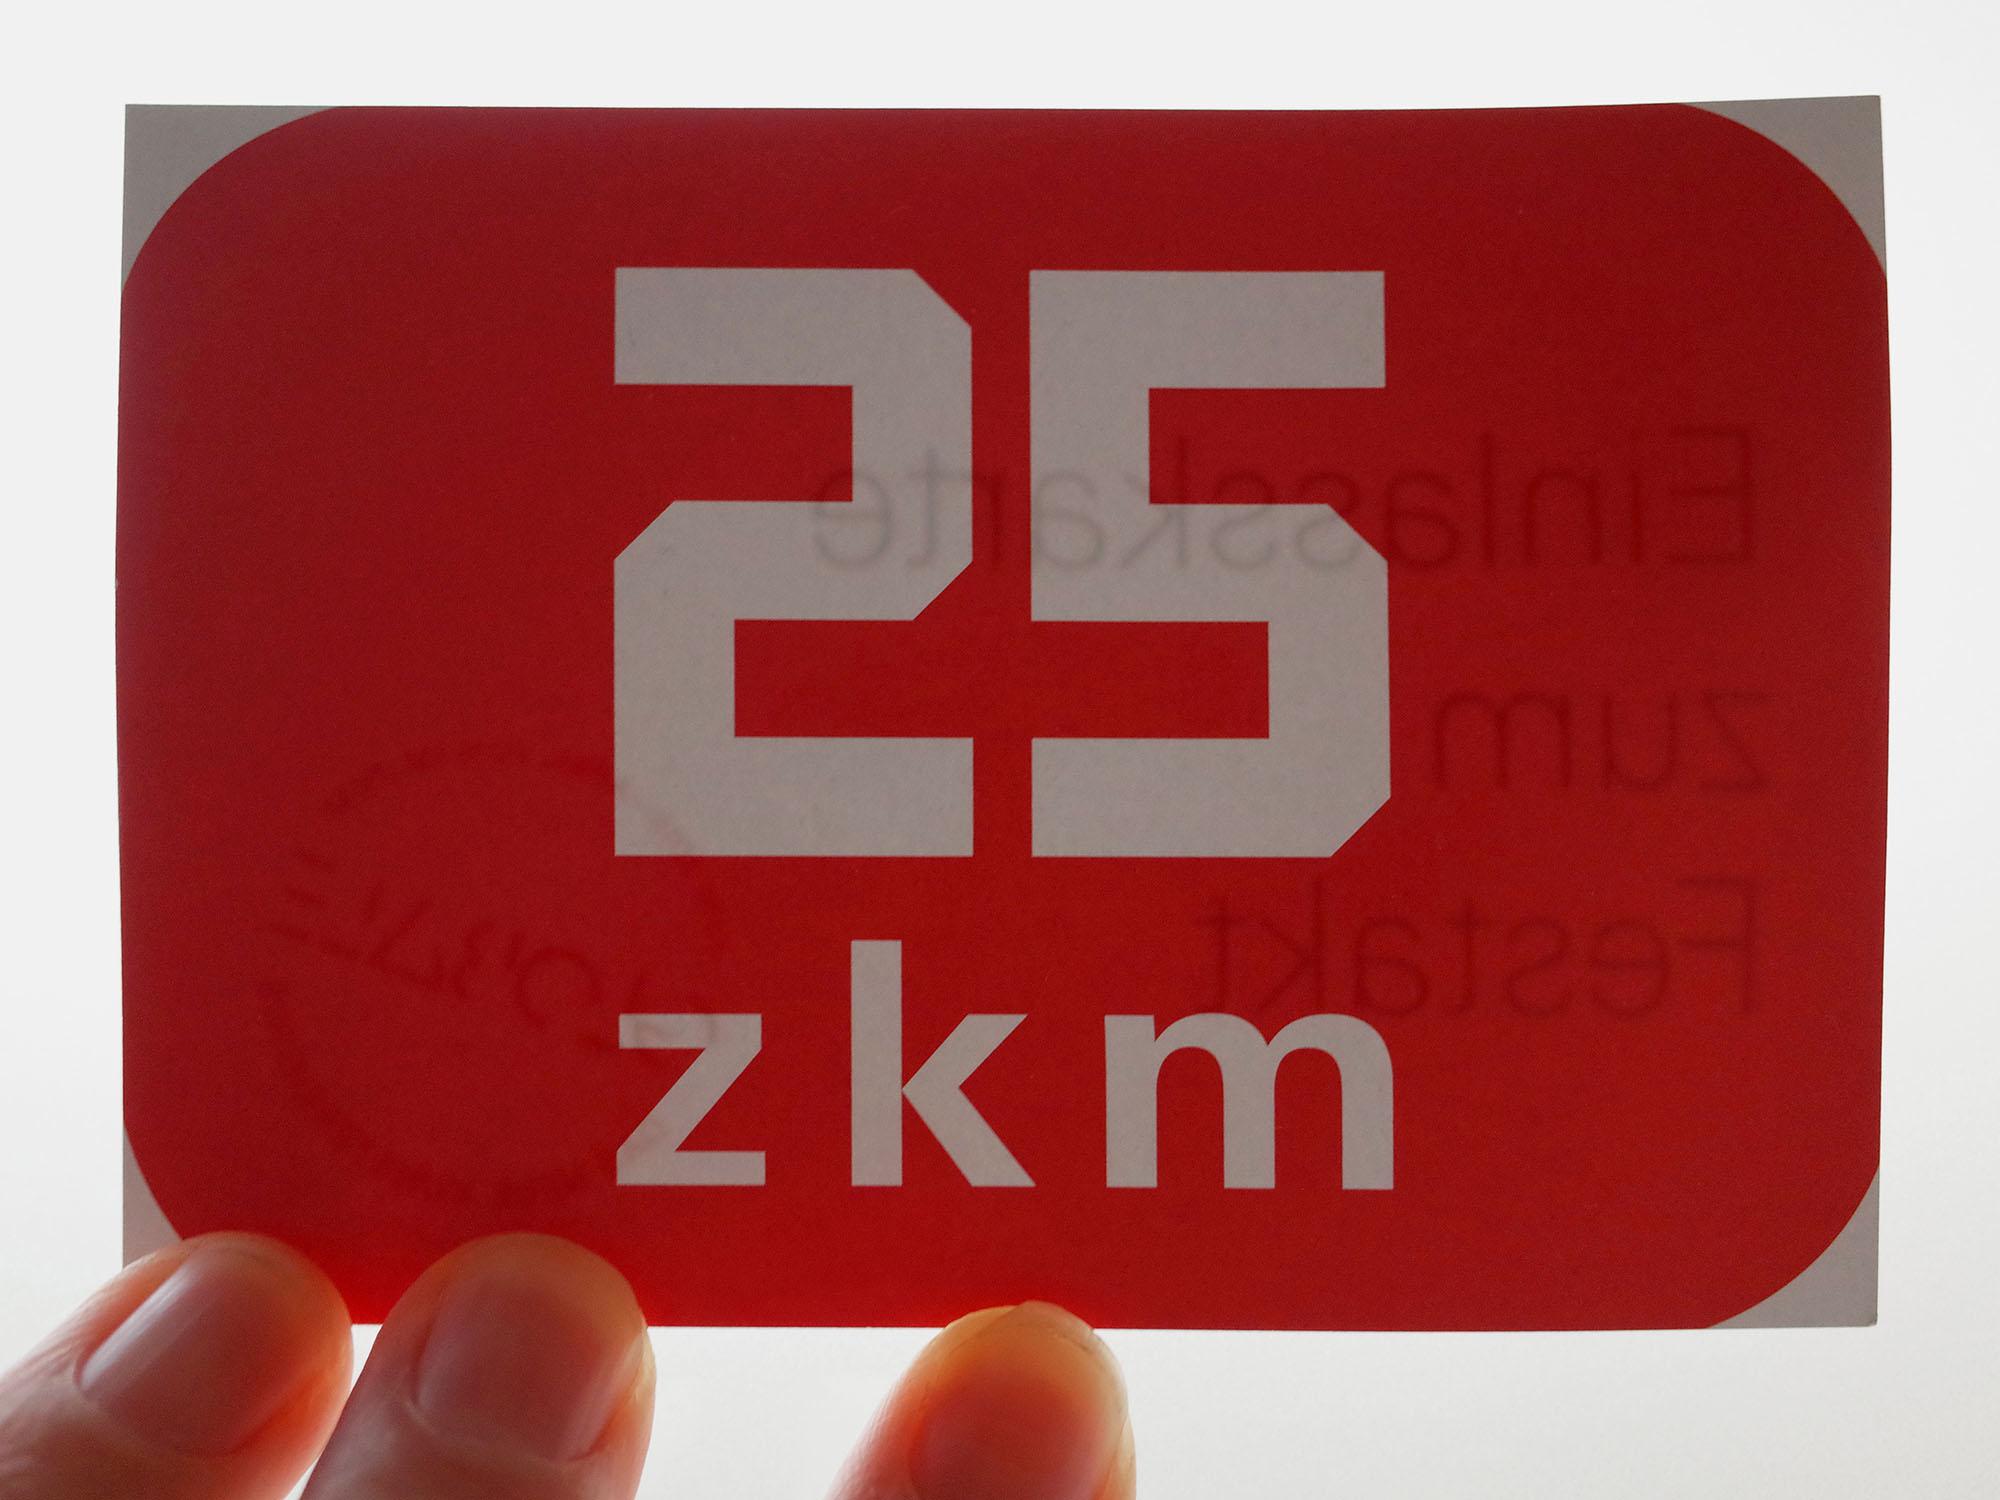 25 zkm